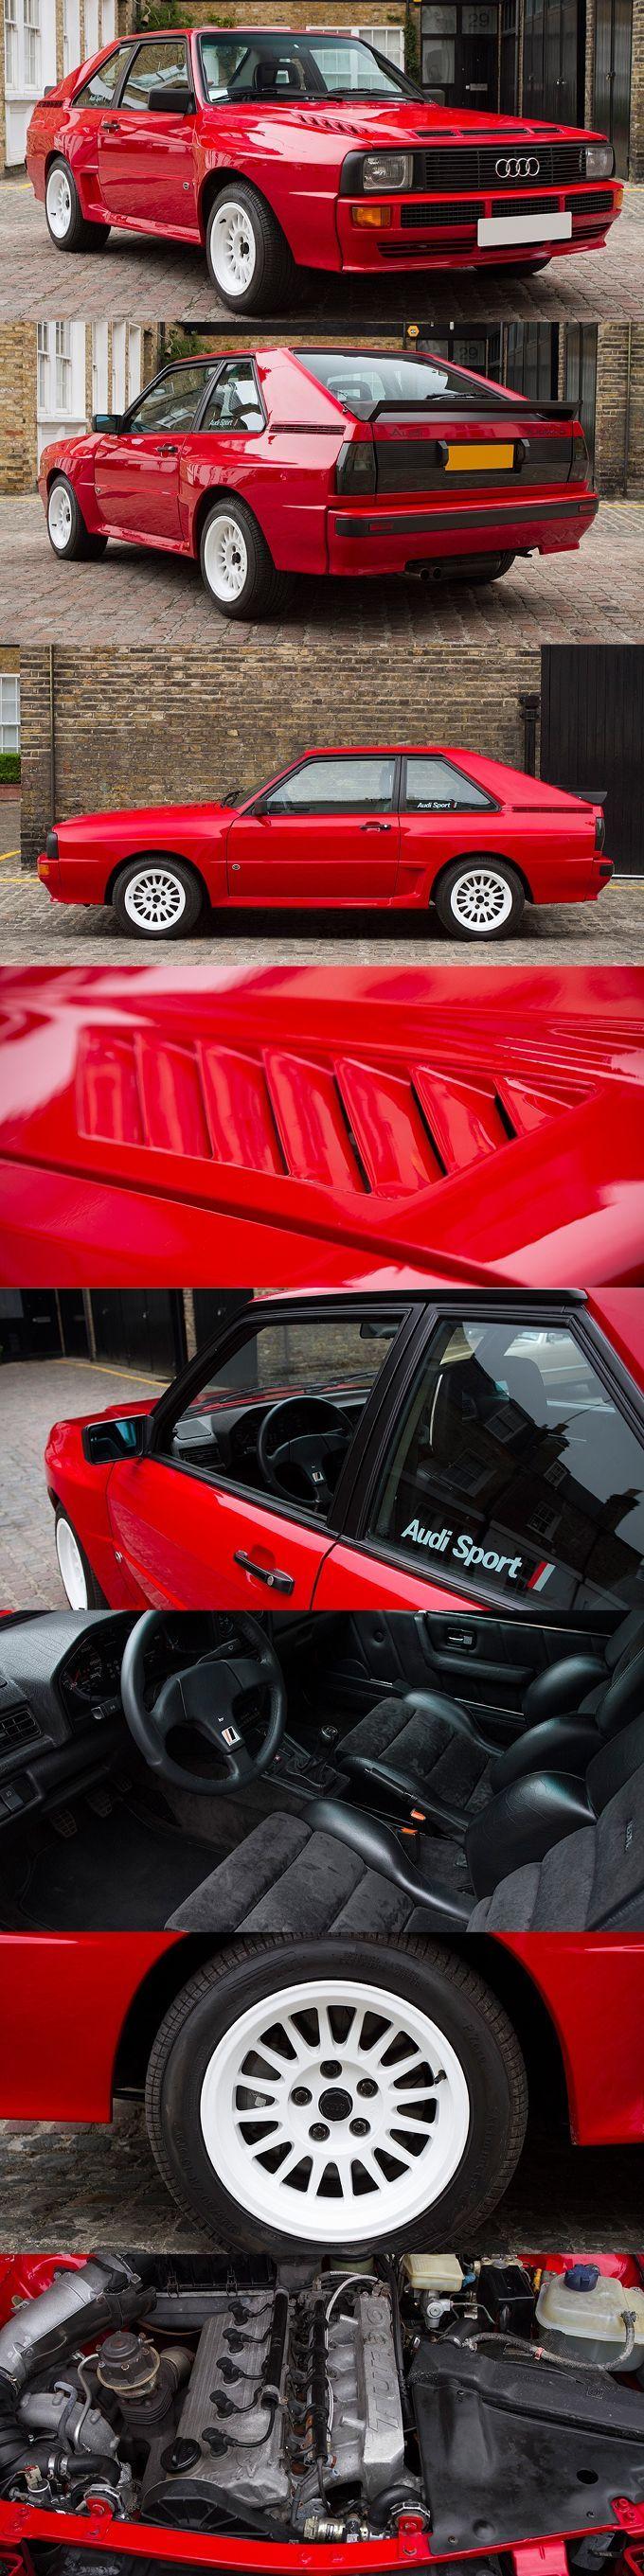 Audi Audi ,